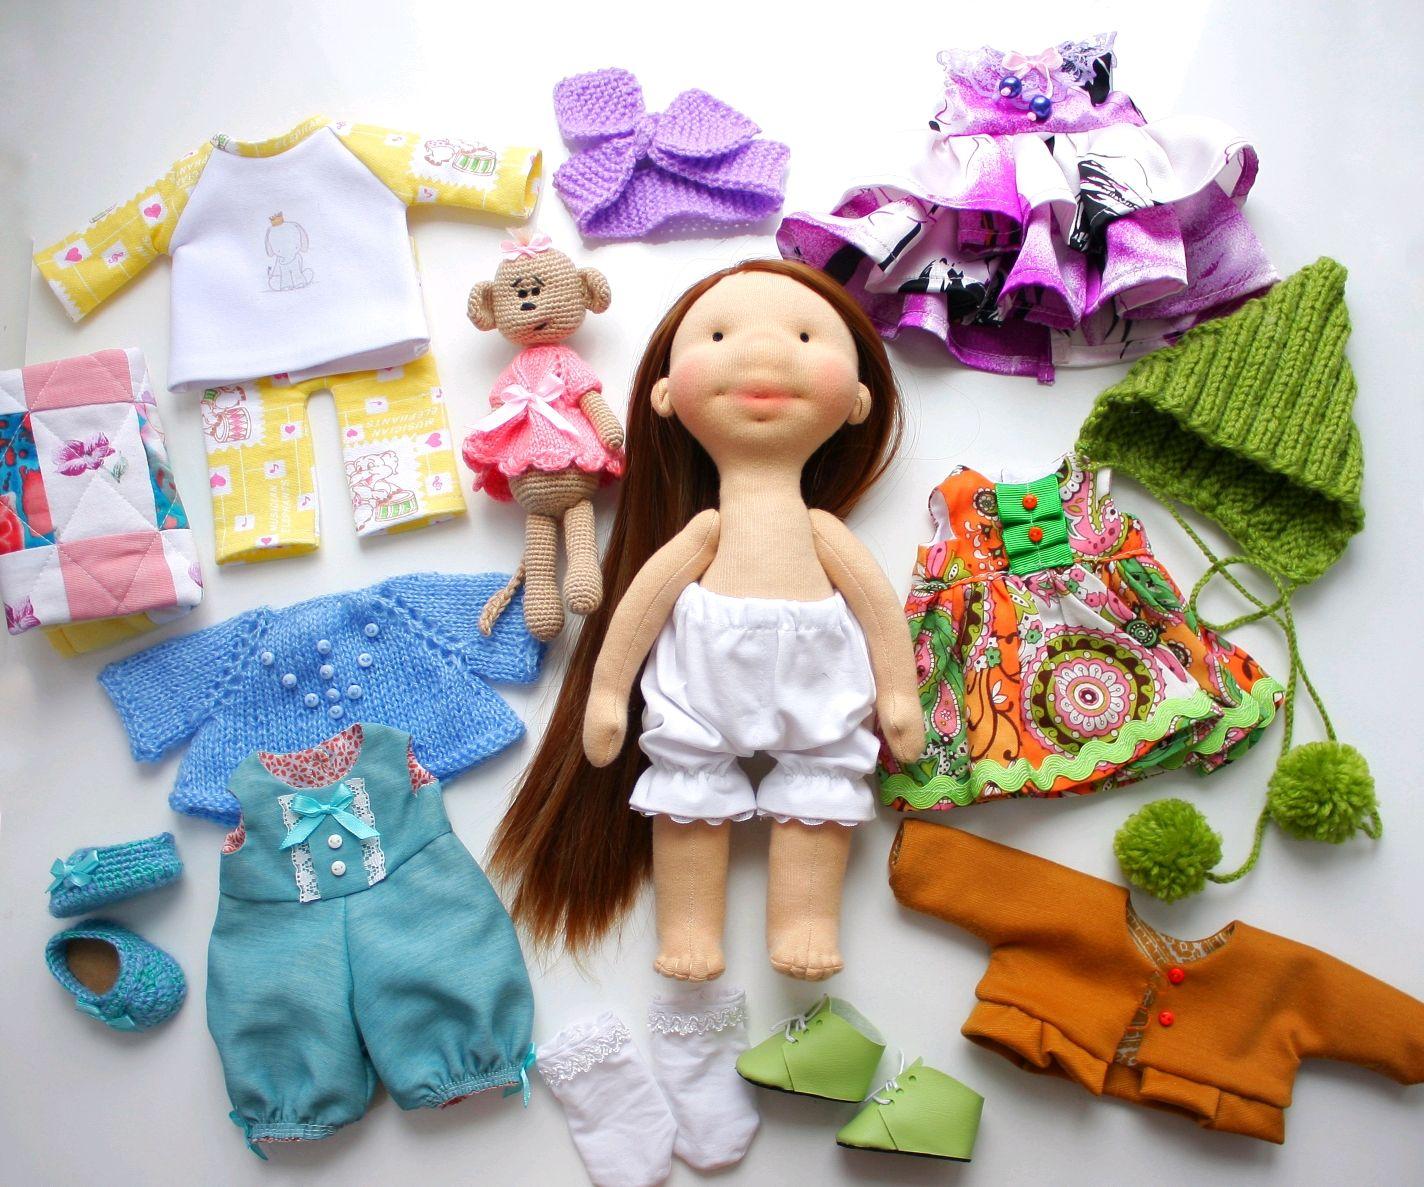 Кукла со съемной одеждой, Игрушки, Москва, Фото №1